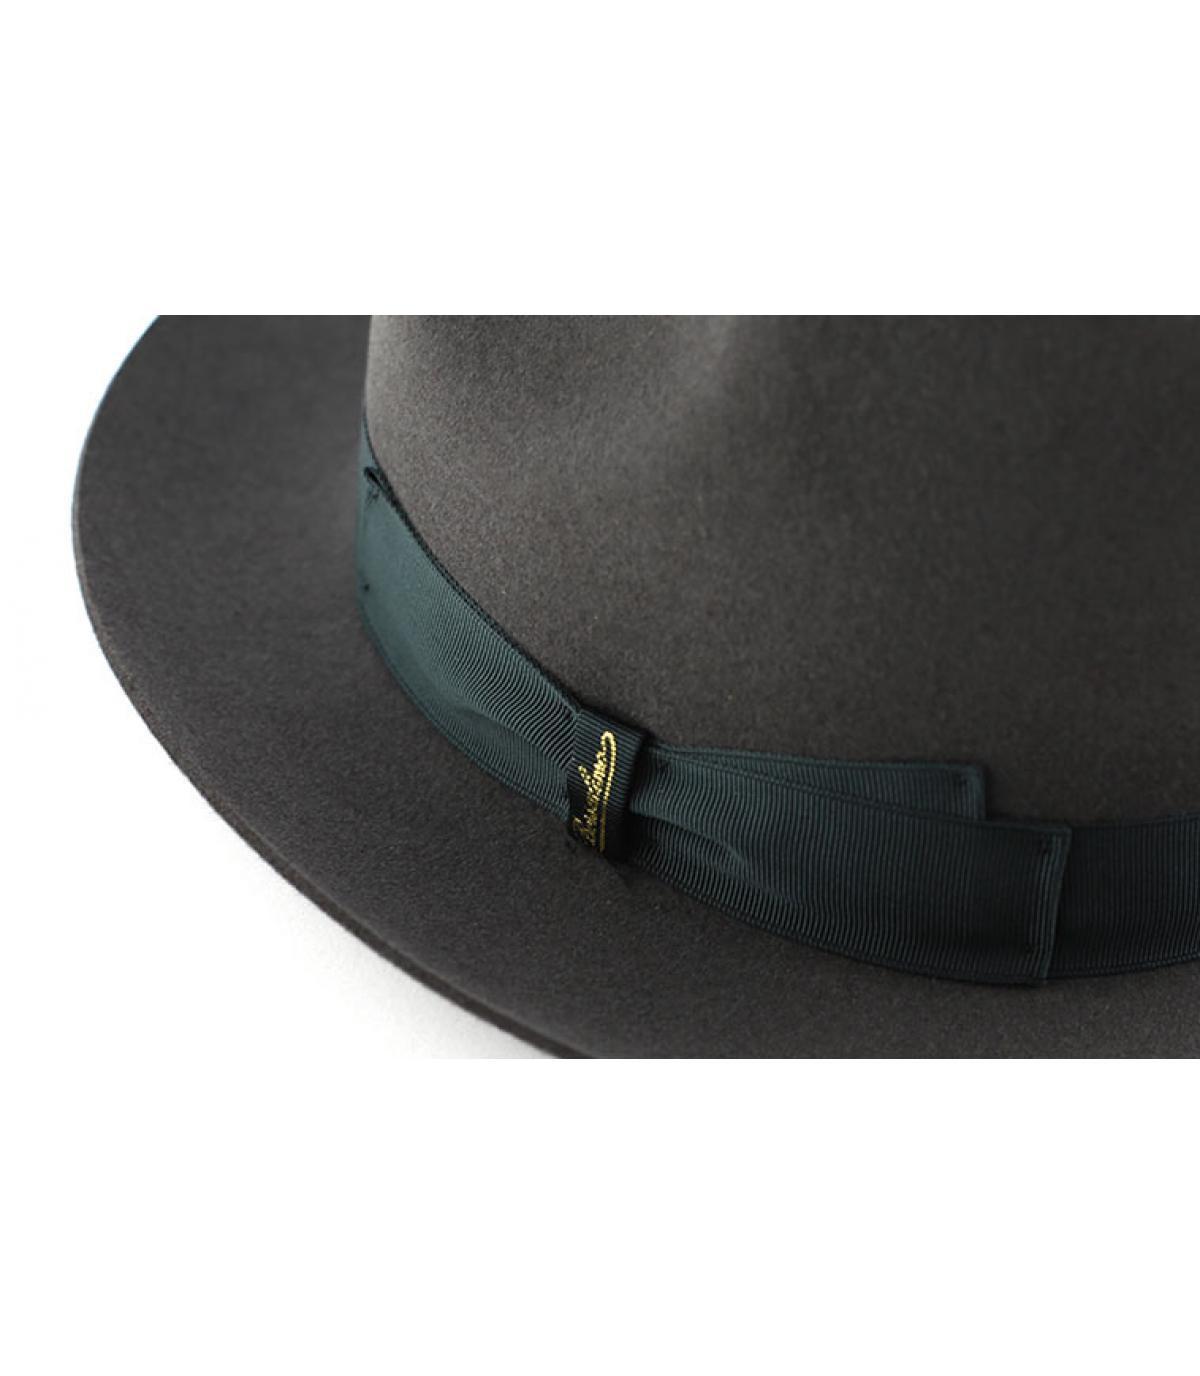 Details Marengo grey fur felt hat - Abbildung 2